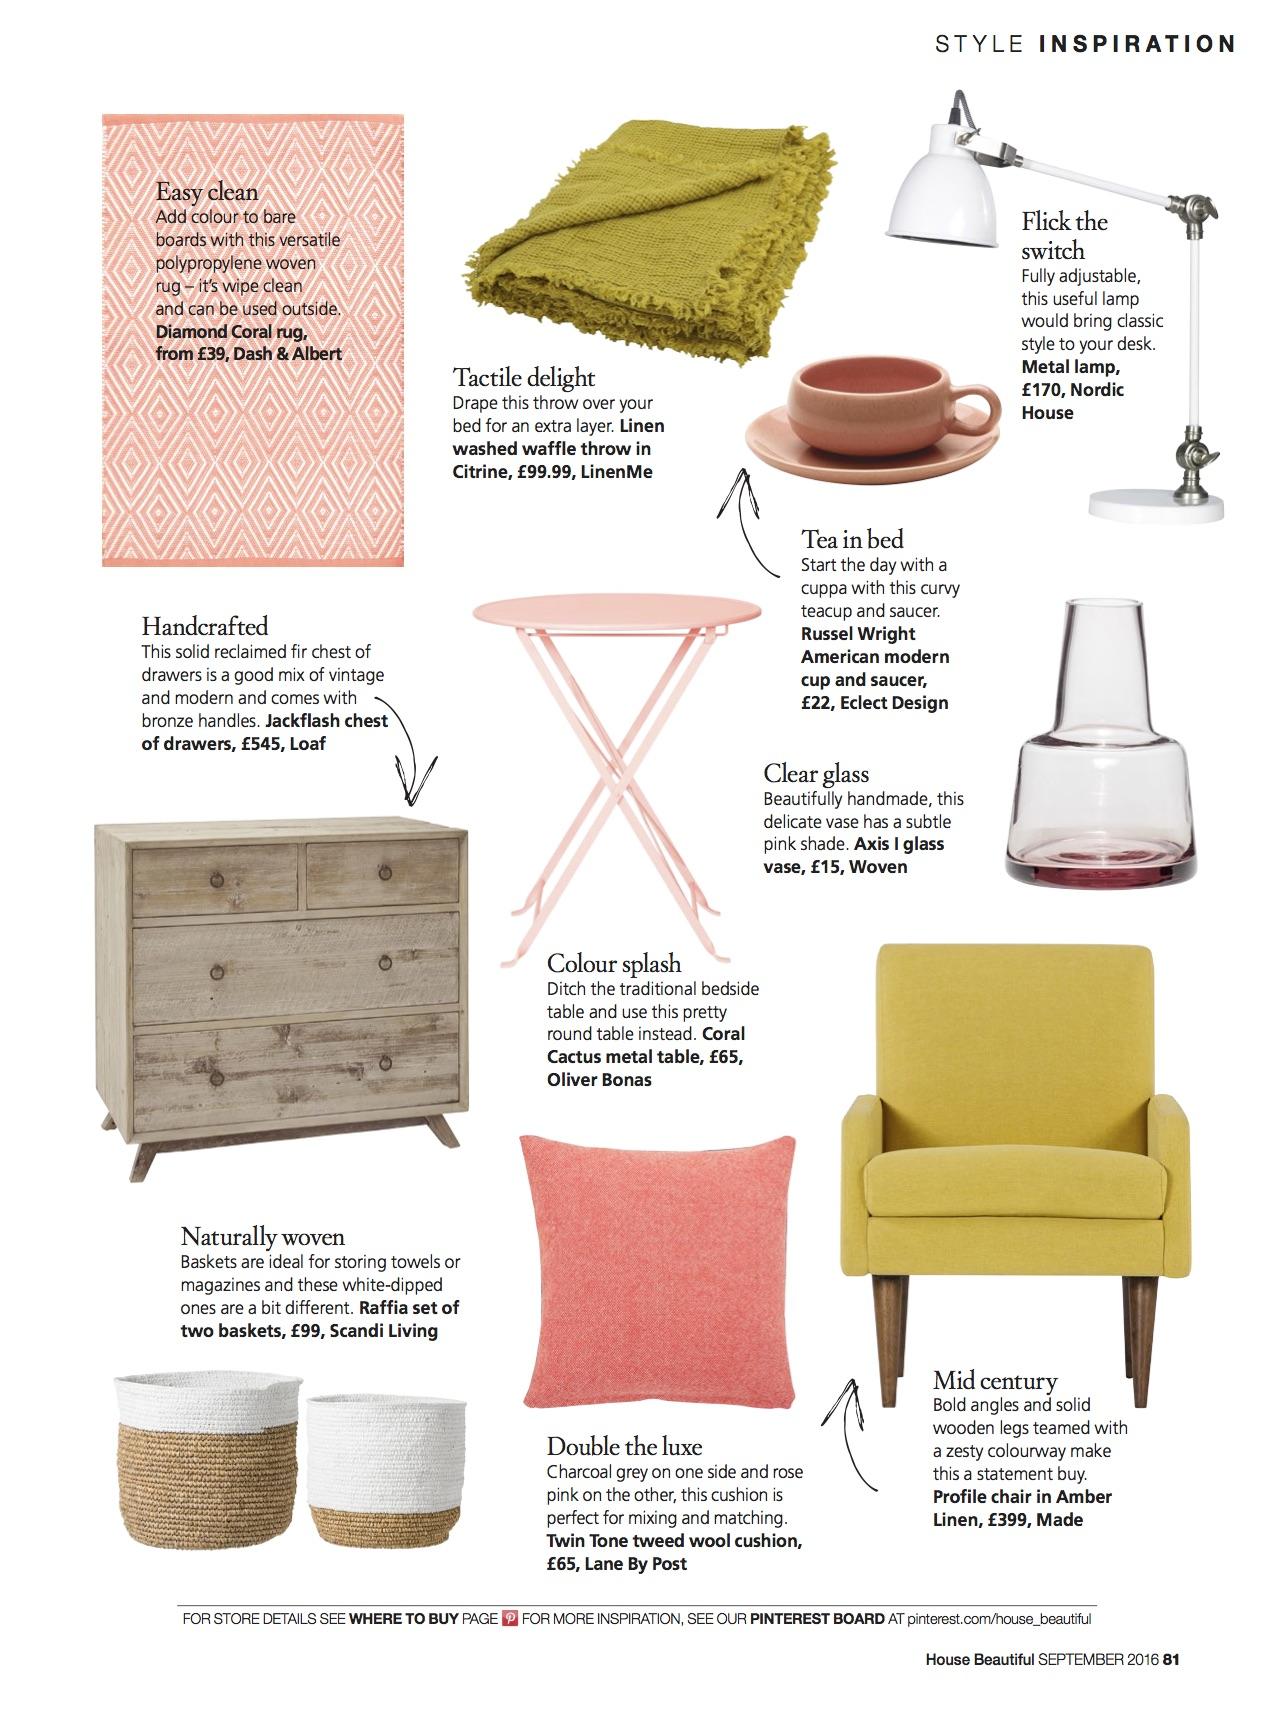 House Beautiful, September 2016,  Lane Twin Tone Cushion - Charcoal & Rosie Pink